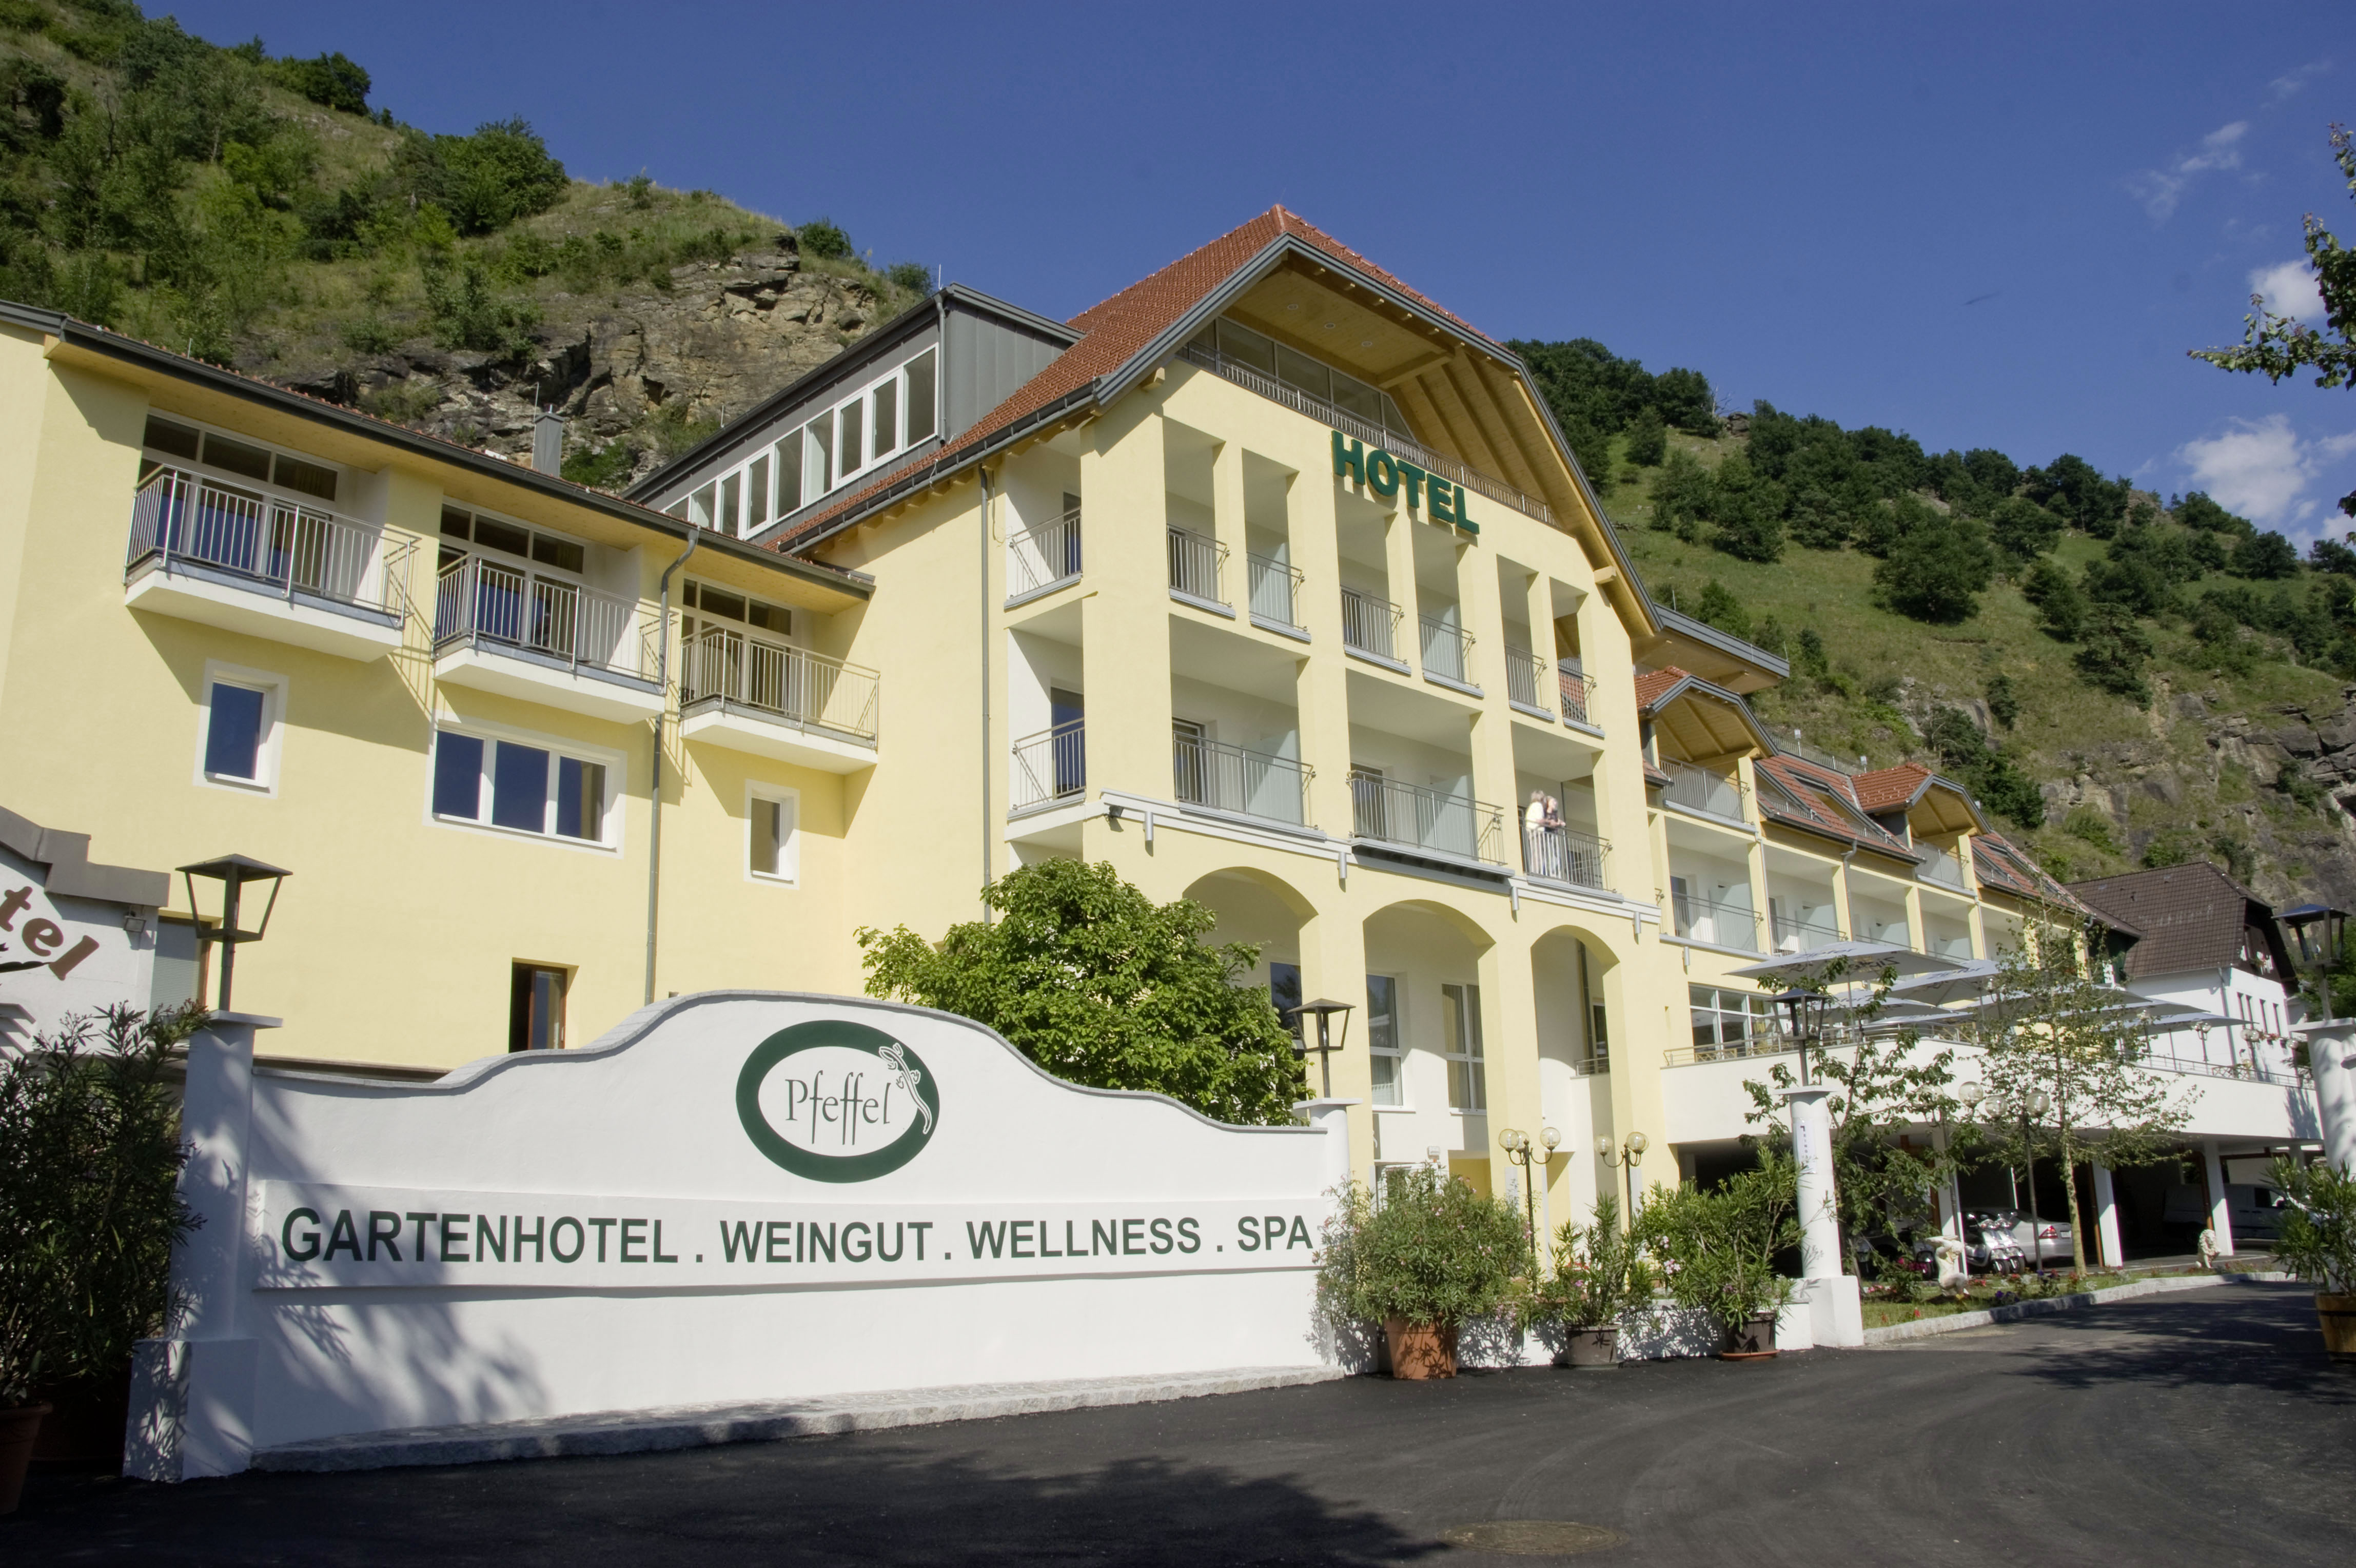 Sommerpanorama Gartenhotel & Weingut Pfeffel @ Alexander Pfeffel